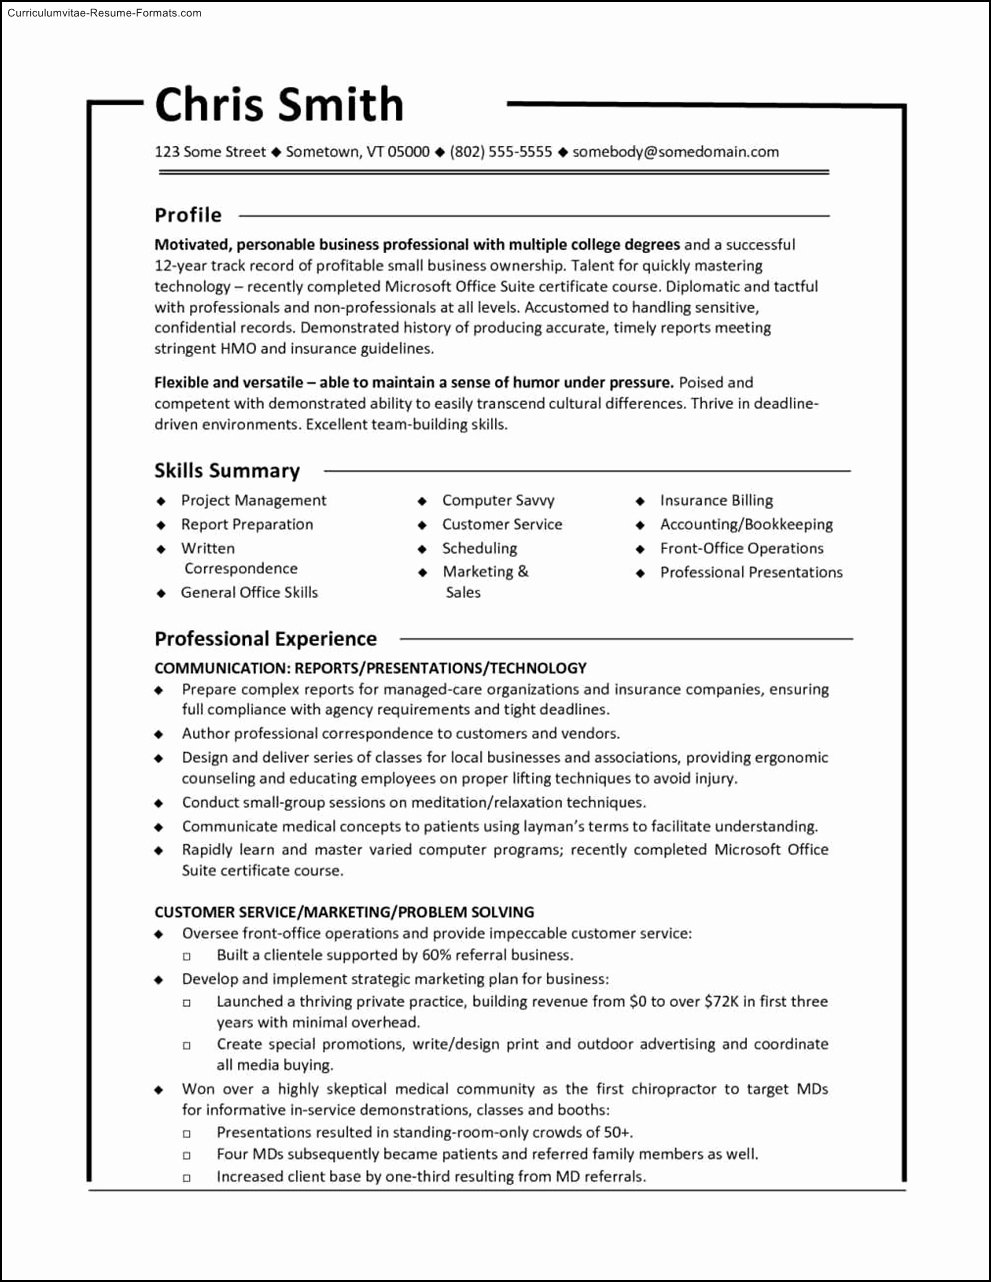 Functional Resume Template Free Beautiful Free Functional Resume Template